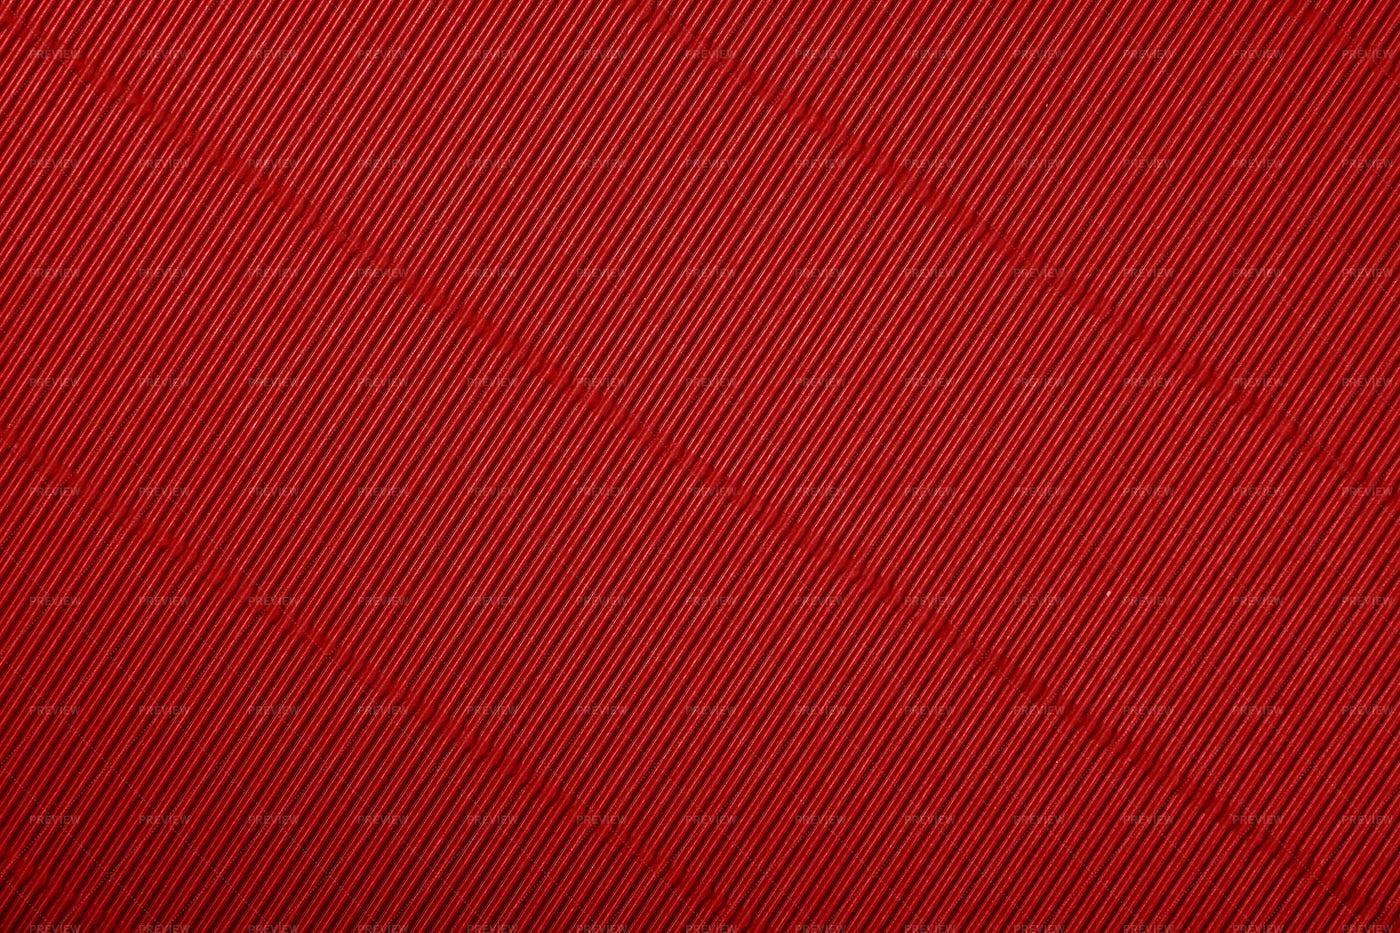 Red Cardboard: Stock Photos